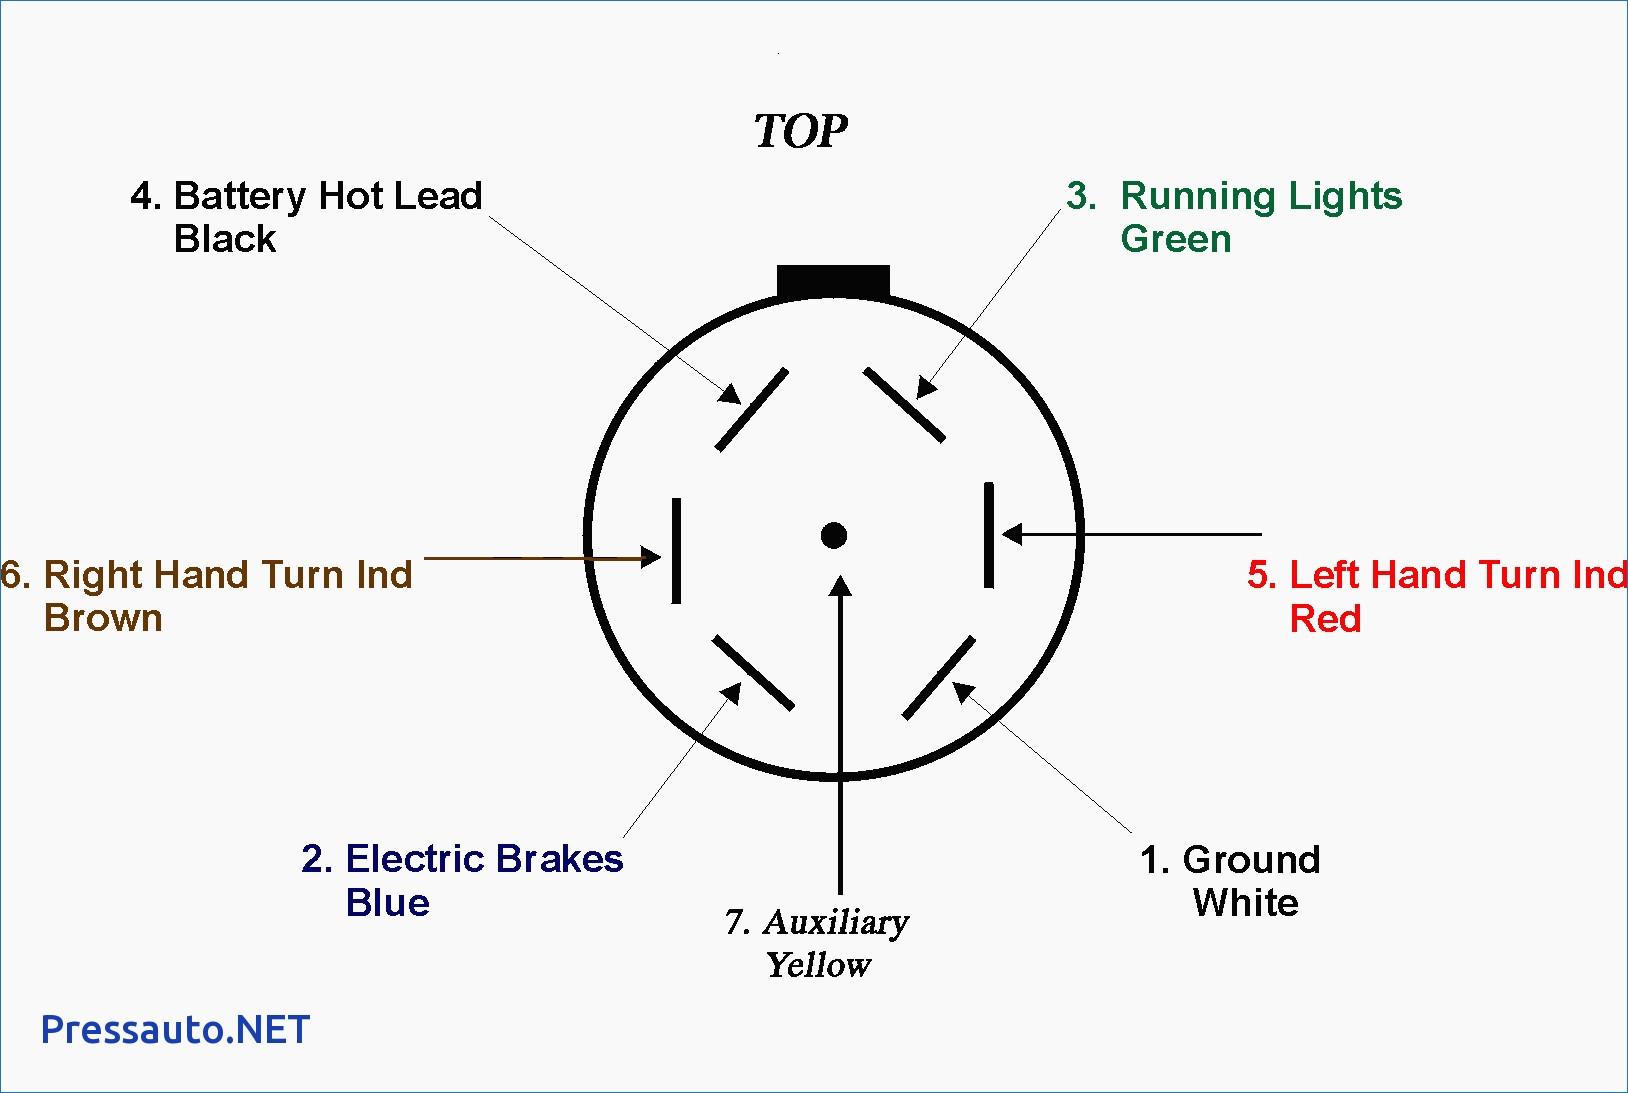 6 pin to 7 pin trailer wiring harness ml 8776  rv wiring diagram on 7 pin trailer light wiring diagram  pin trailer light wiring diagram